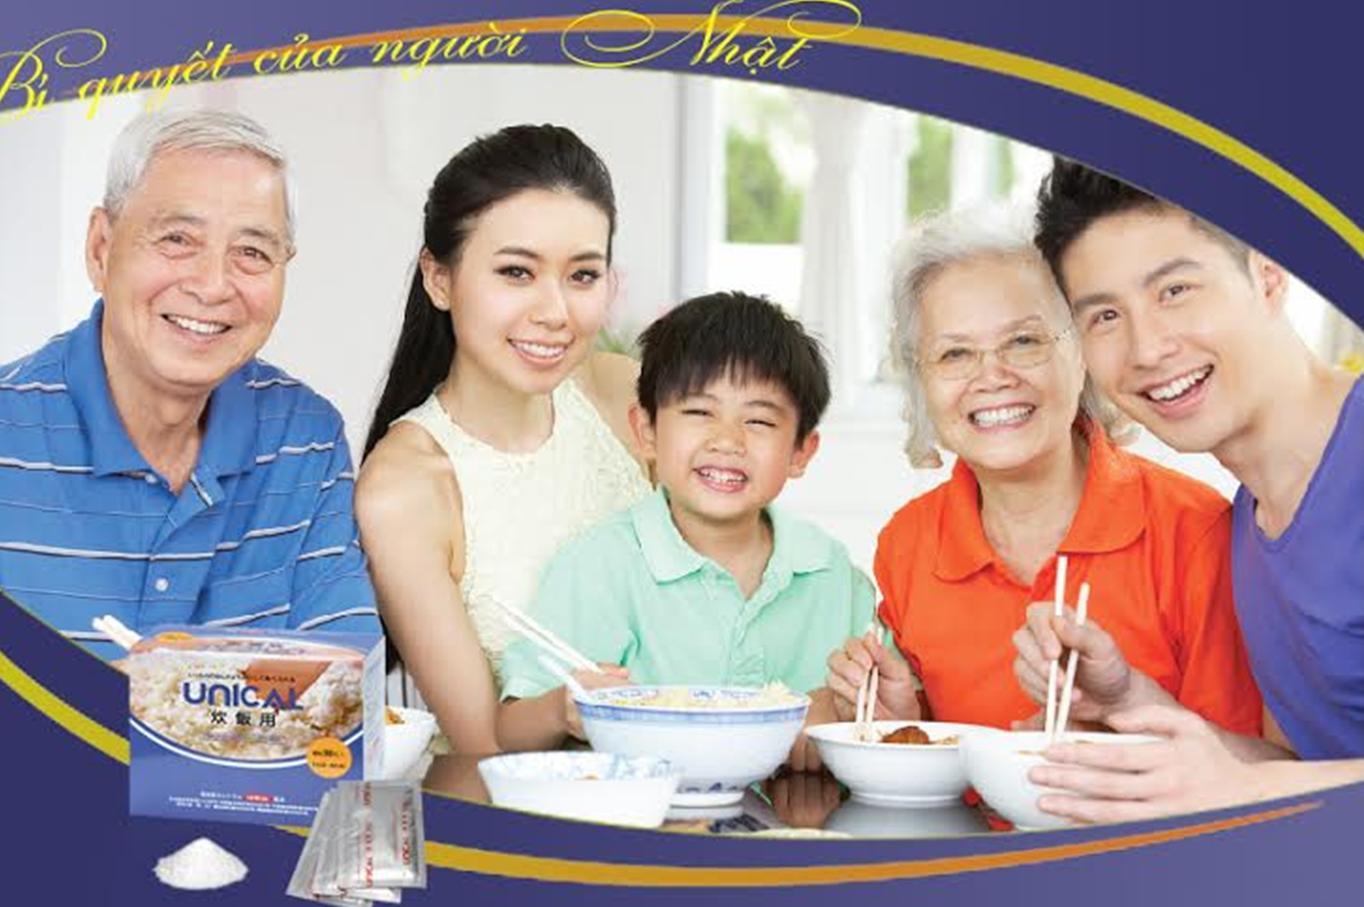 tai sao canxi unical for rice lai hap thu len den 99